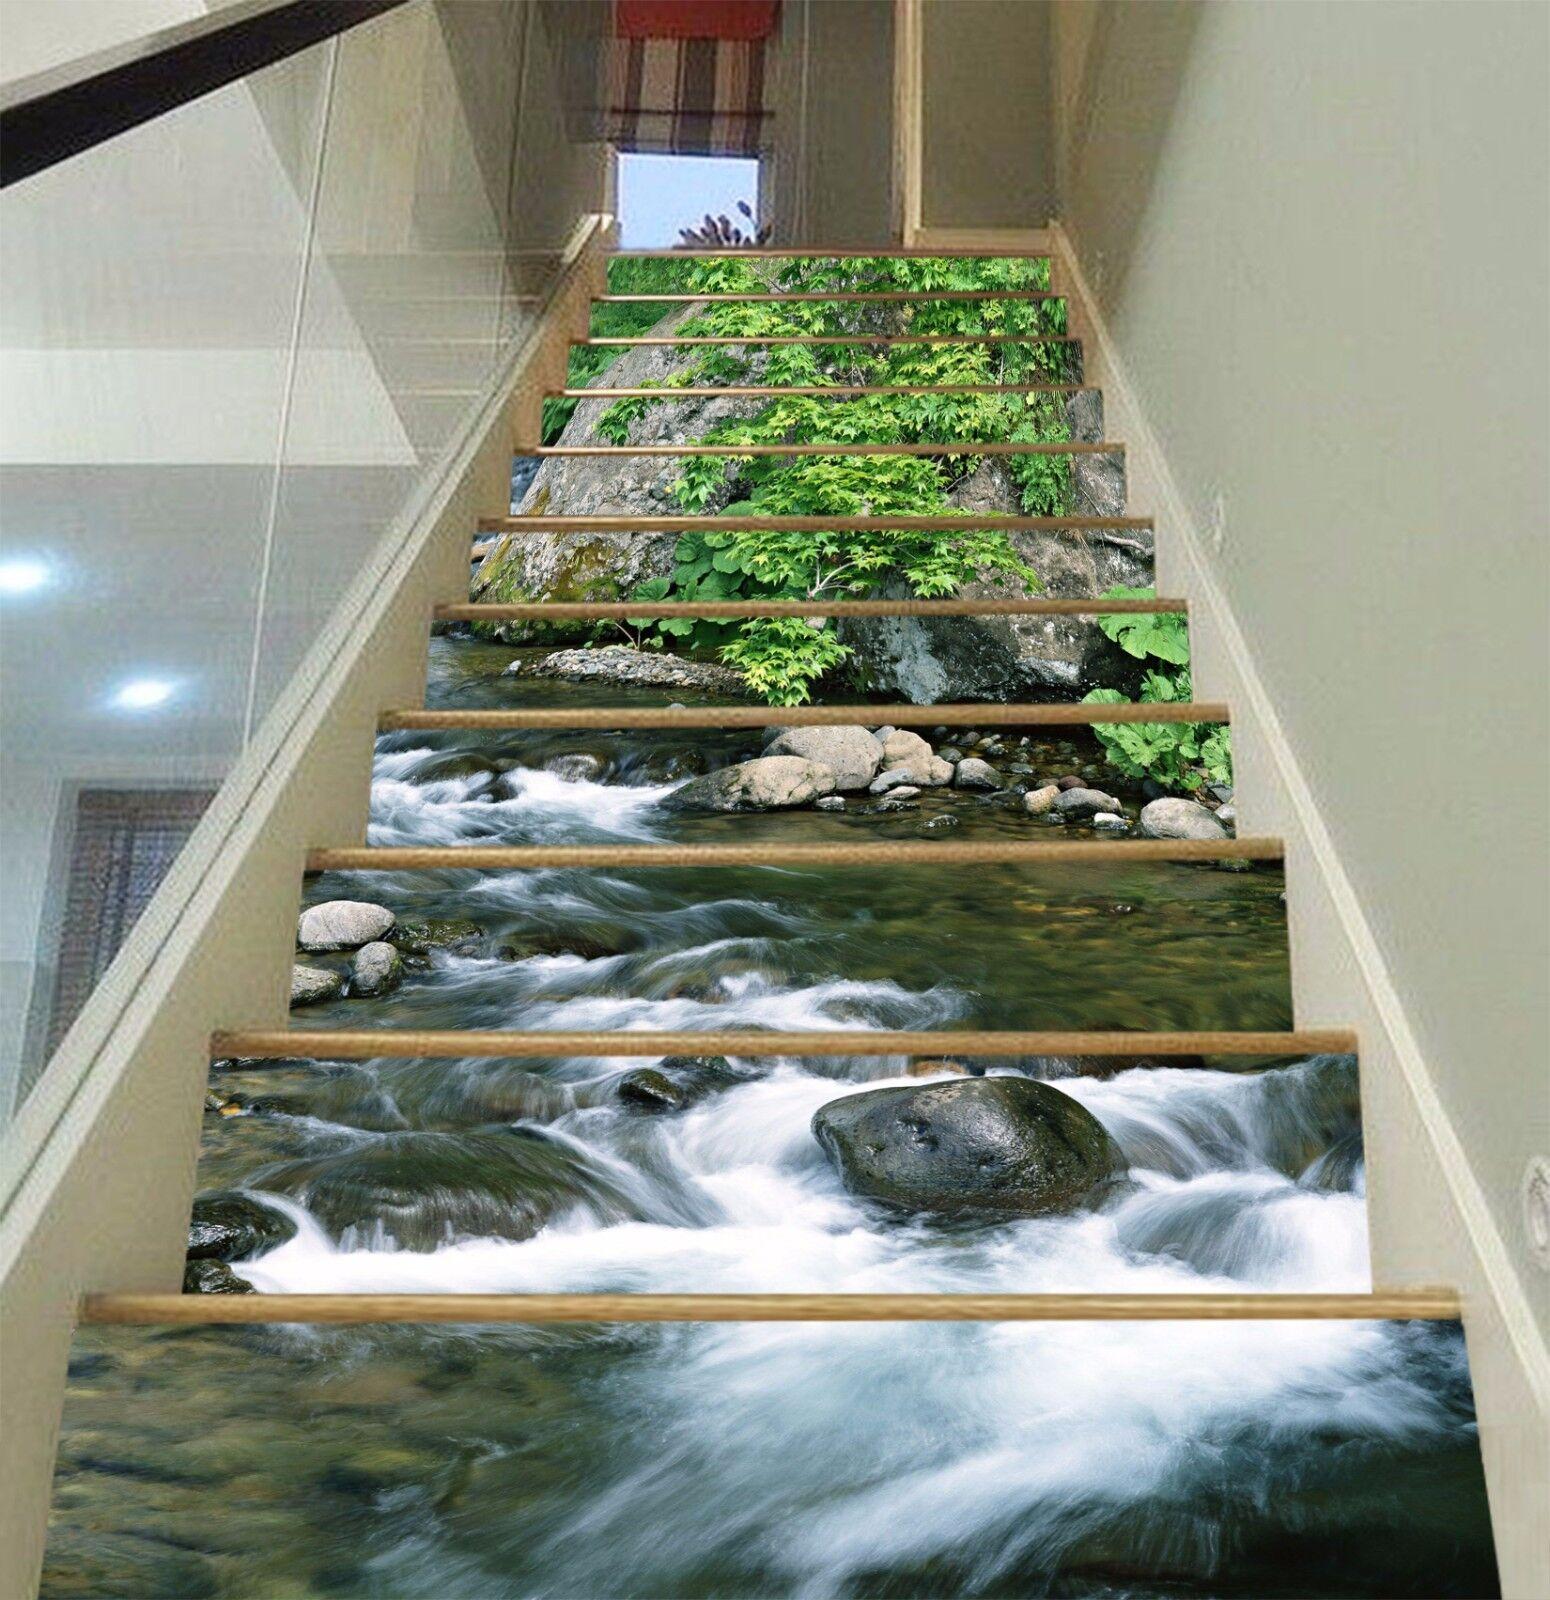 3D Grass River 414 Risers Decoration Photo Mural Vinyl Decal Wallpaper CA